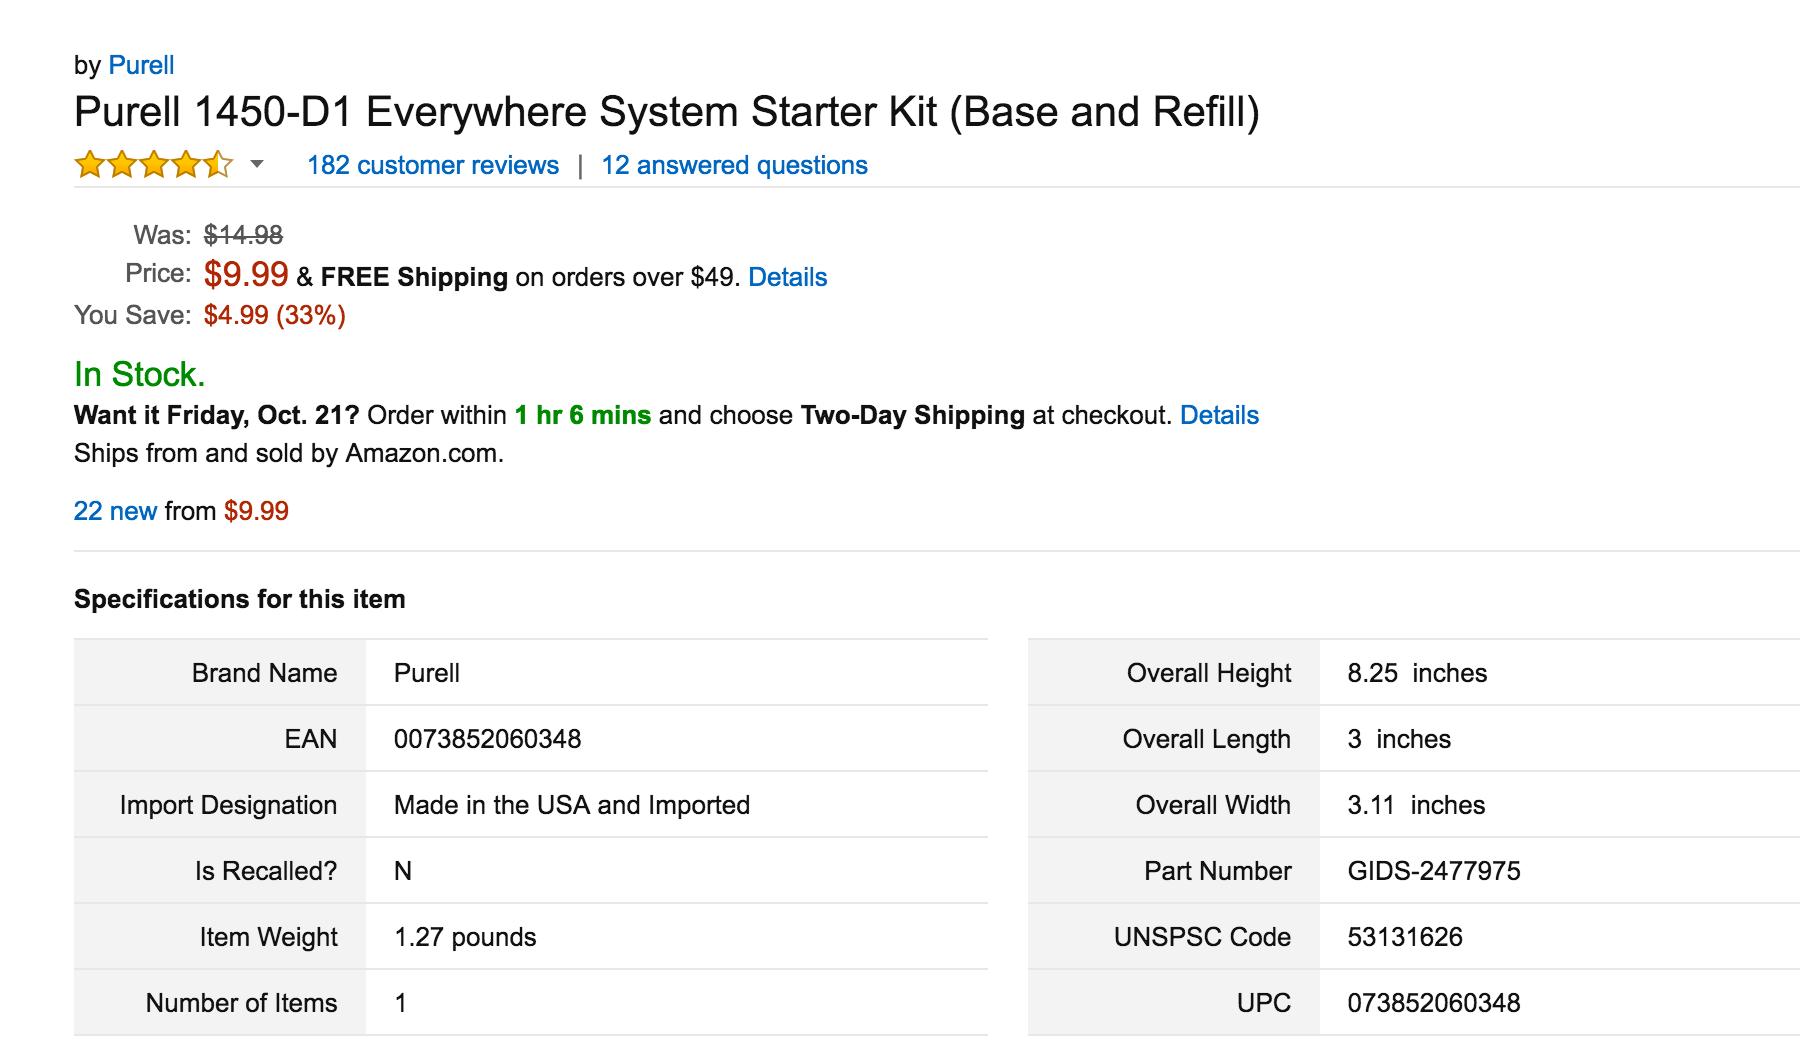 purell-1450-d1-everywhere-system-starter-kit-5